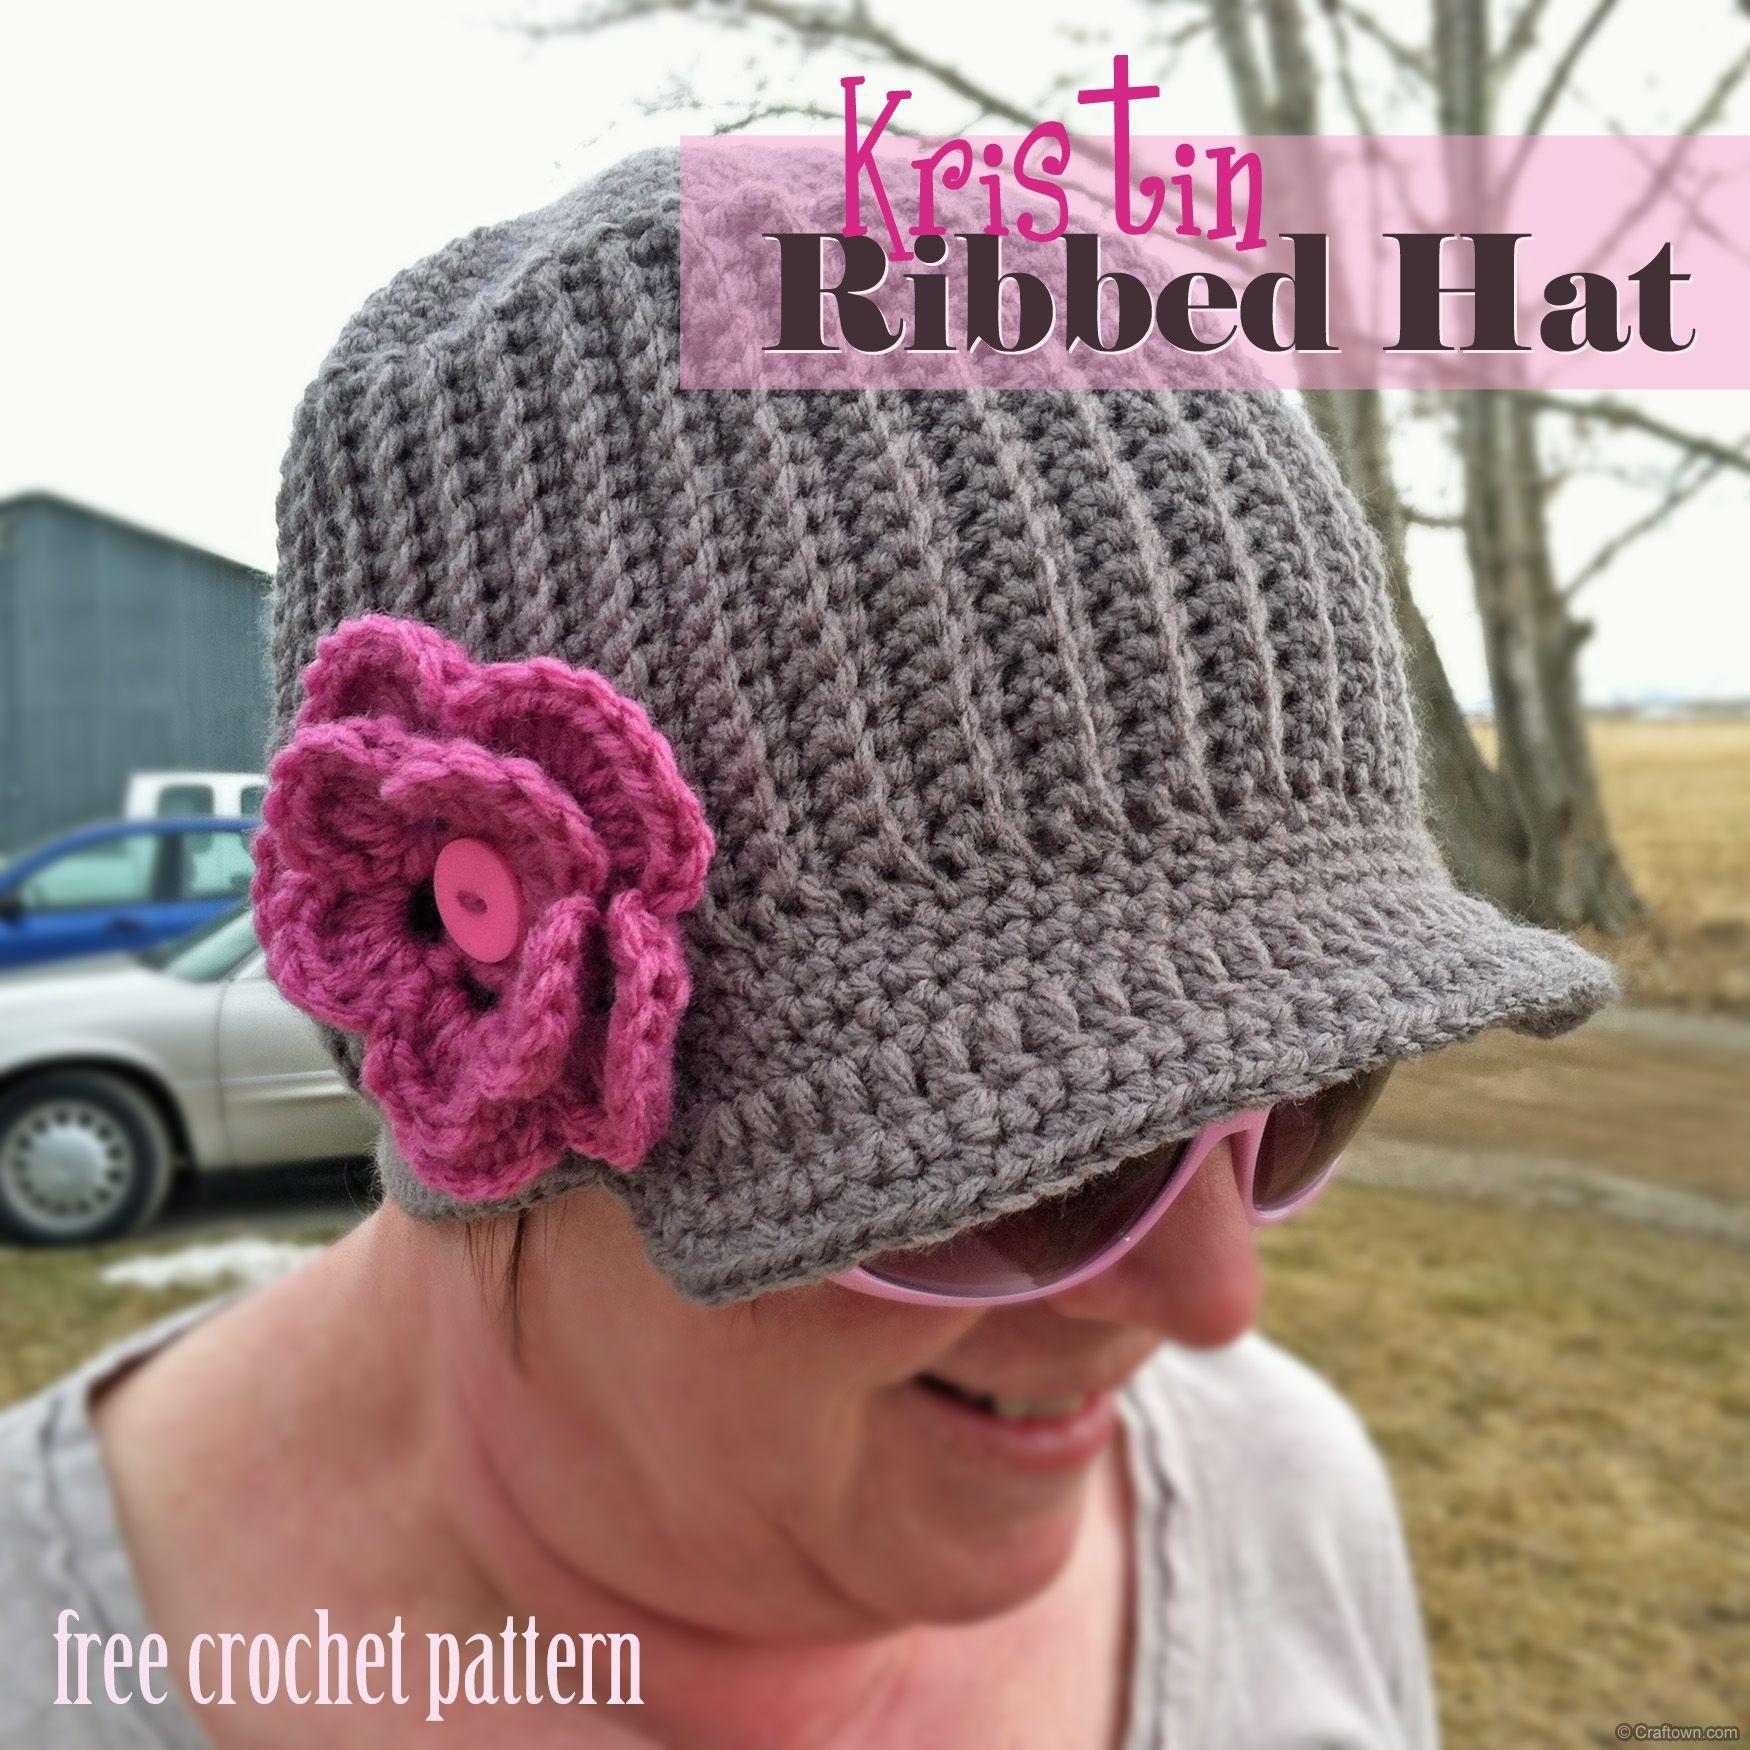 8b6008f69 Free Crochet Pattern - Kristin Ribbed Hat | Chemo Cap Patterns ...